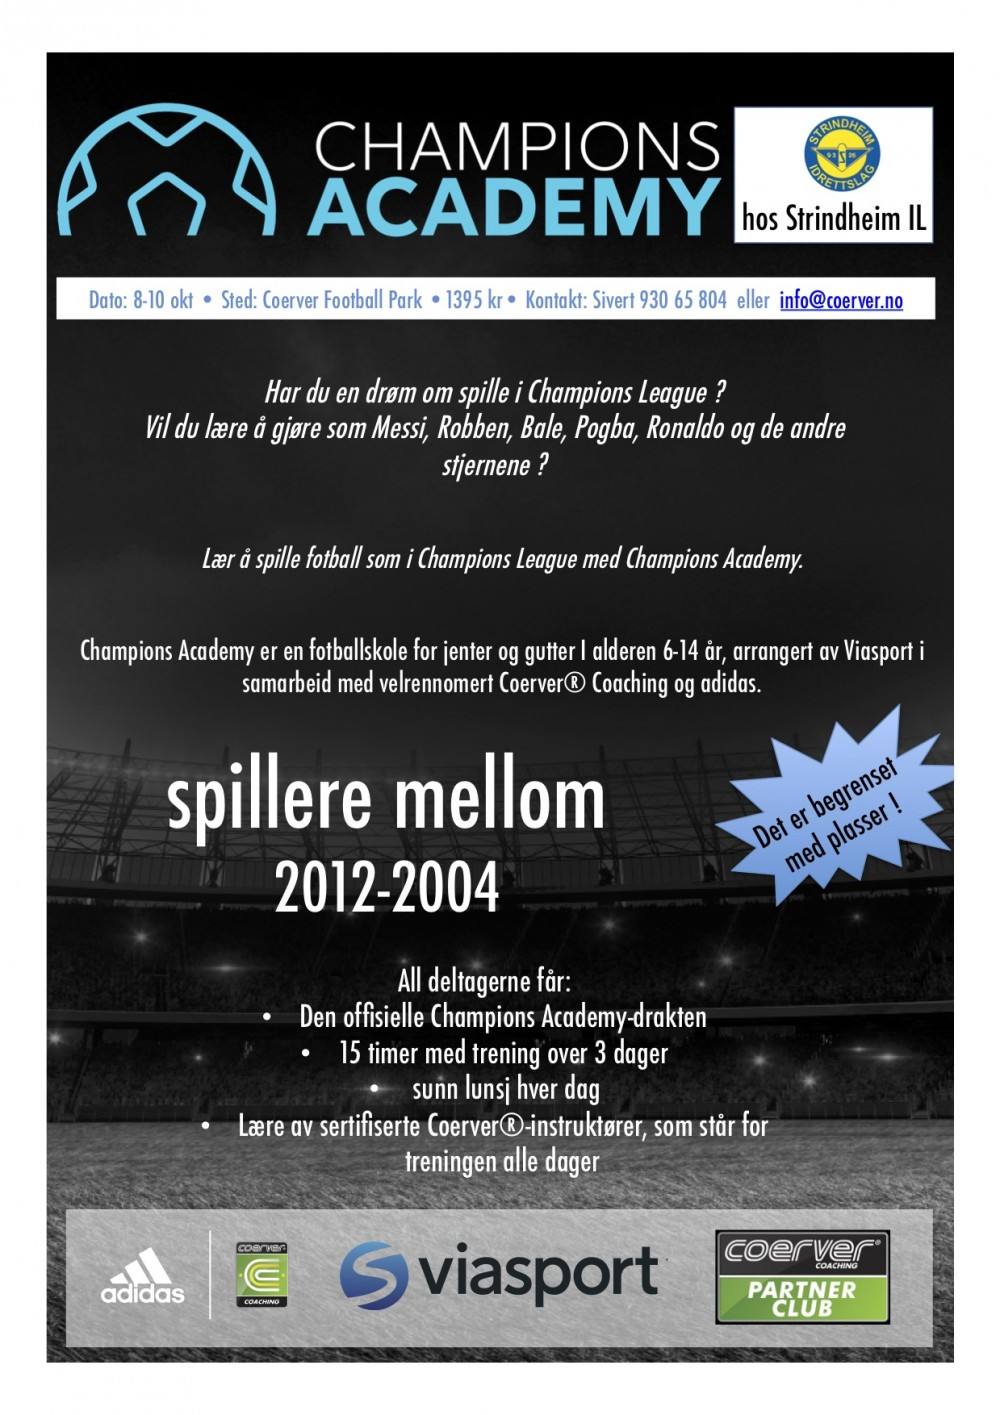 Champions Academy hos Strindheim IL uke 41